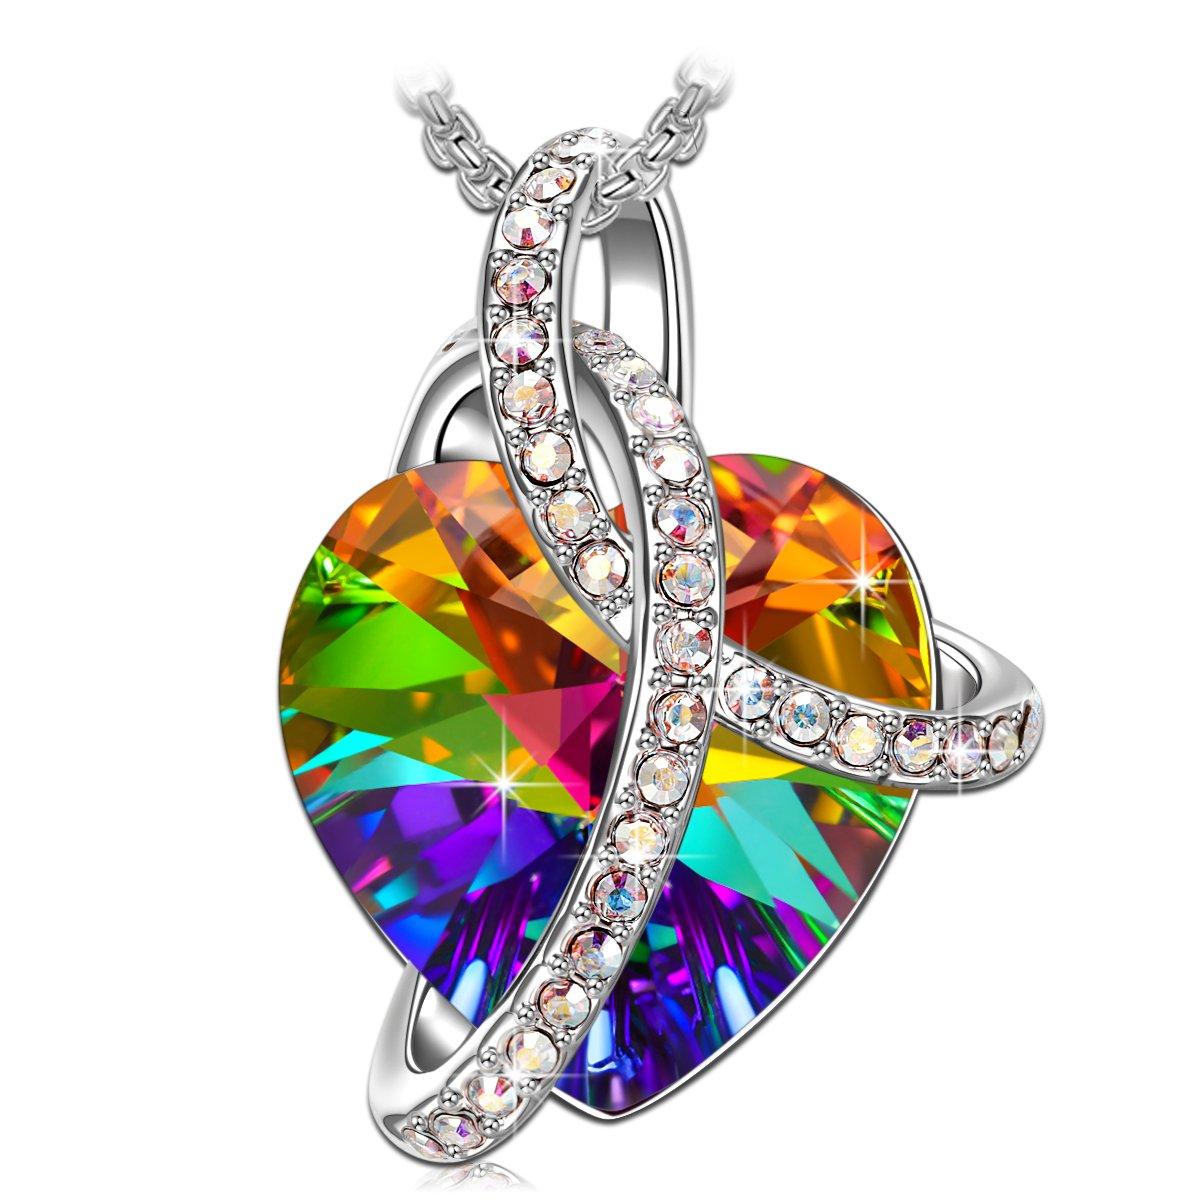 Love Heart' Fashion Jewelry Necklace Made Swarovski Crystals, Jewelry Women Gifts Mom